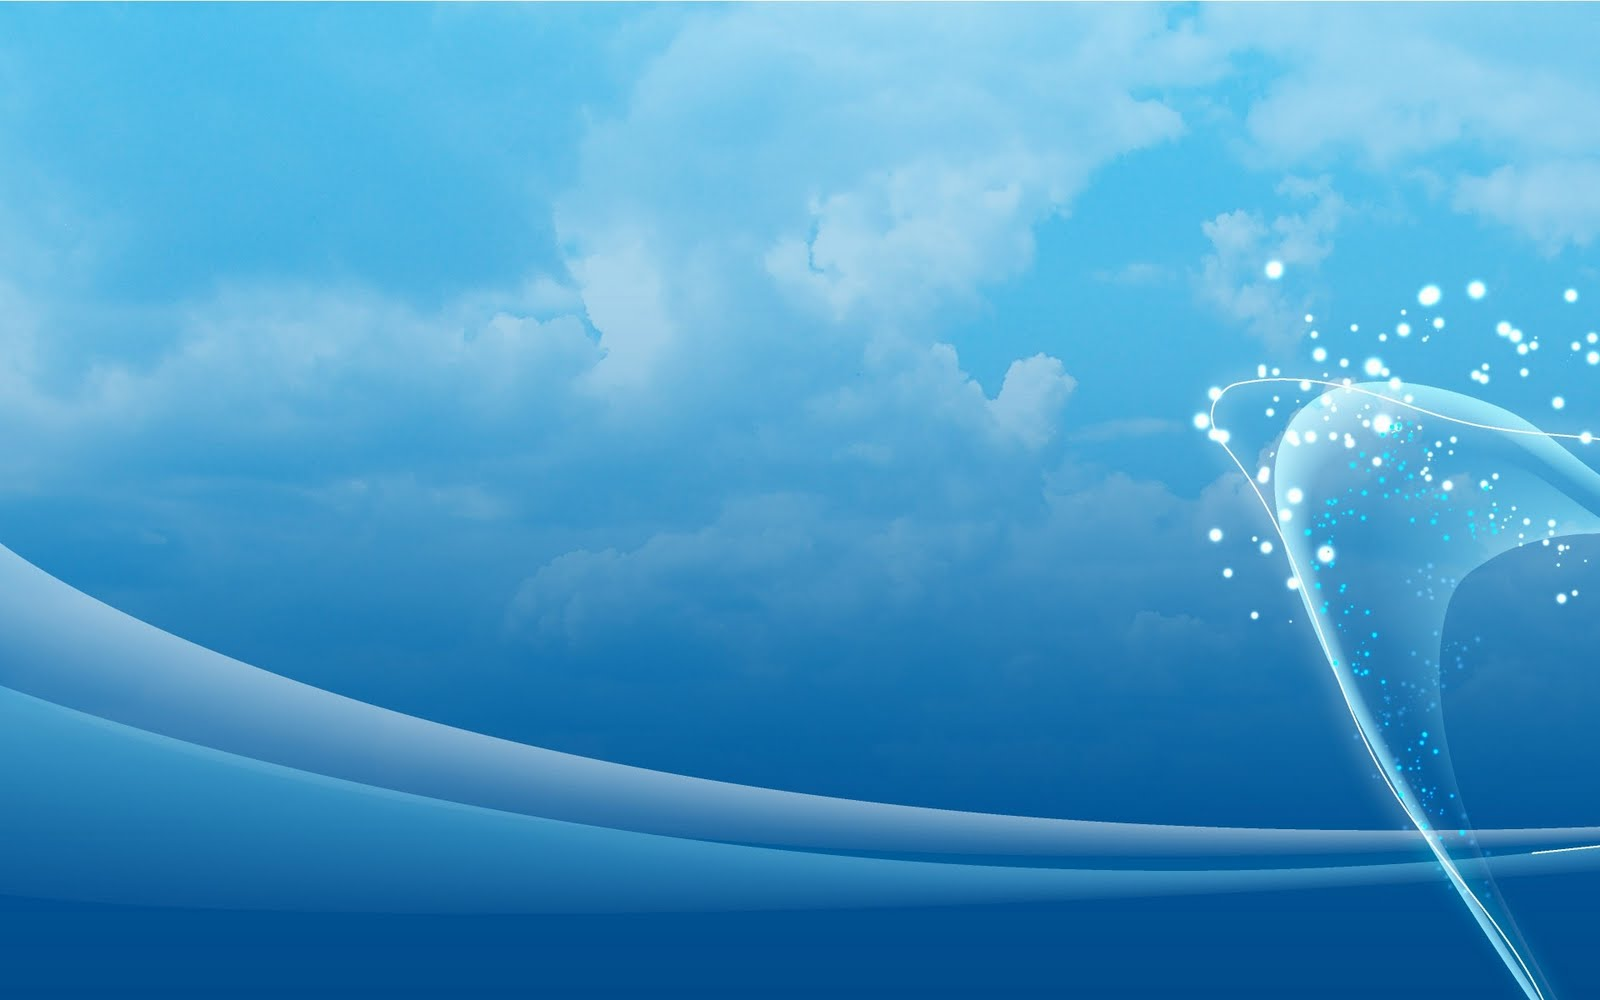 http://3.bp.blogspot.com/-9xPqksquKgQ/Th33r81btMI/AAAAAAAAAn0/mDEVg_Loyyk/s1600/Sky+Abstract.jpg